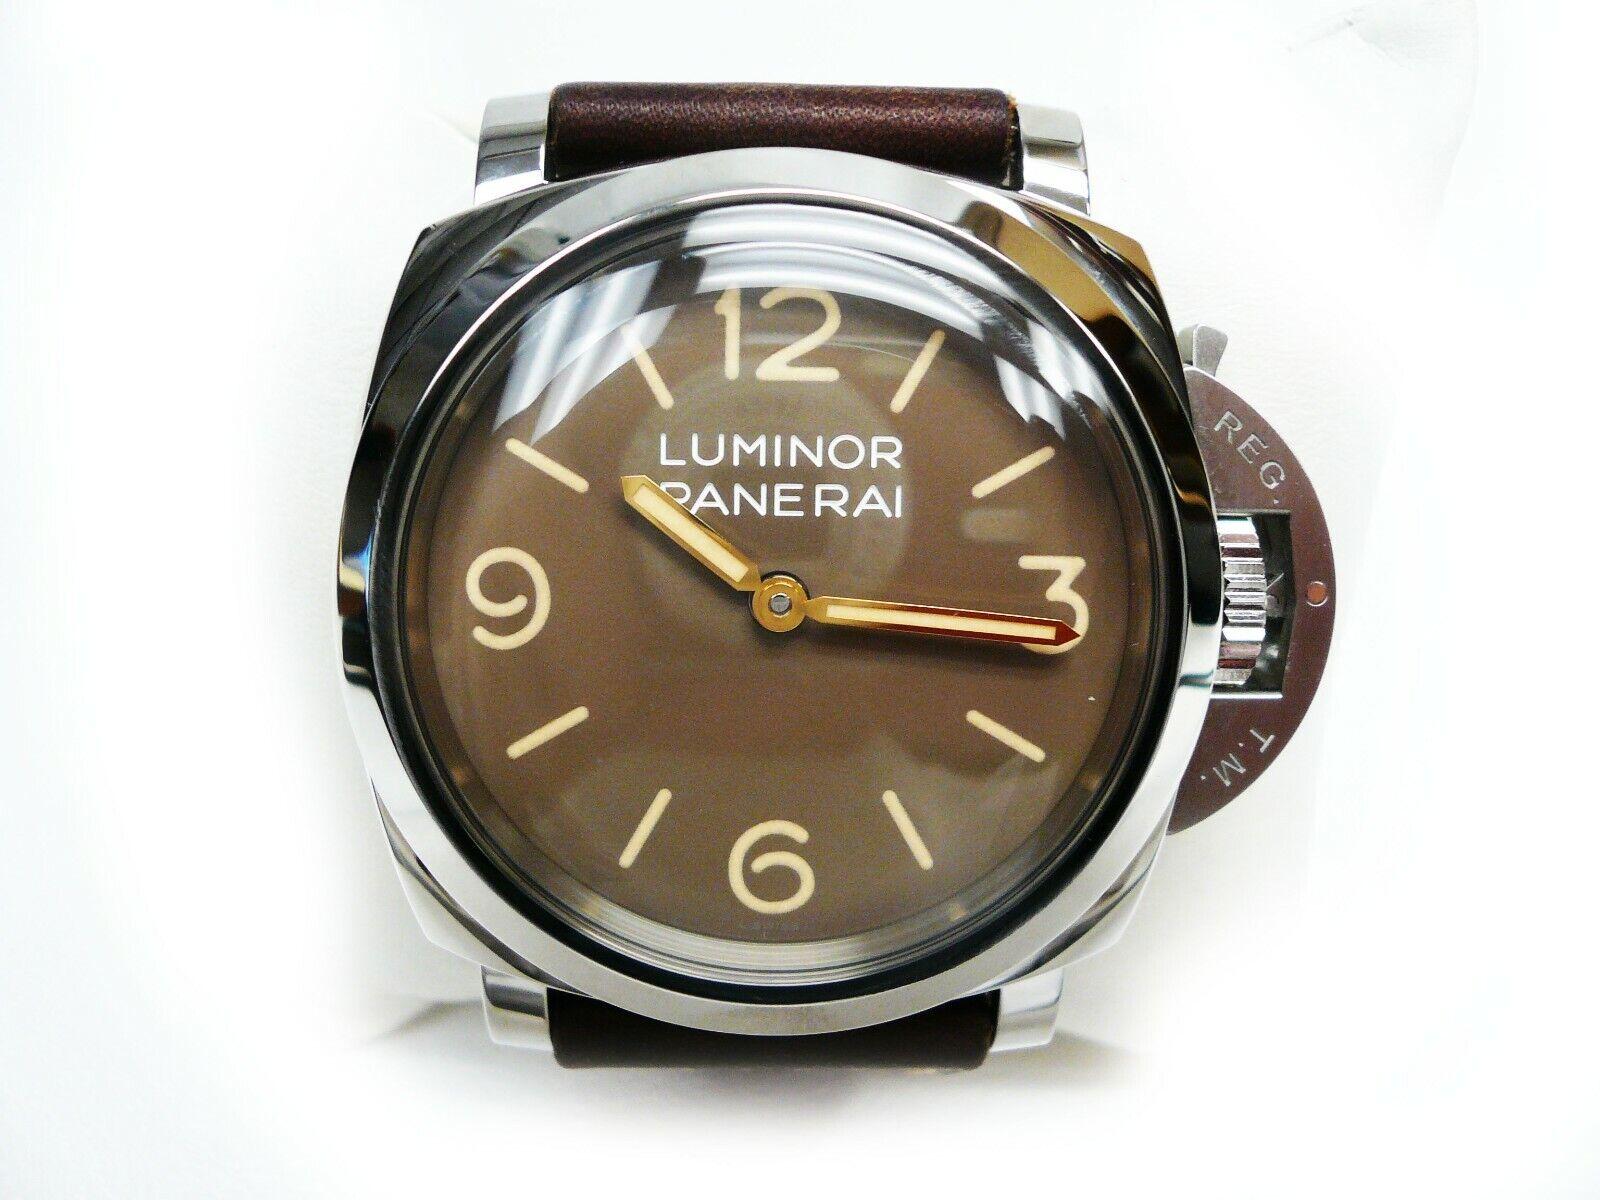 Panerai PAM 663 Luminor 1950 SS Strap Watch Ltd Ed 625/1000 Box Books Cert 6/19 - watch picture 1